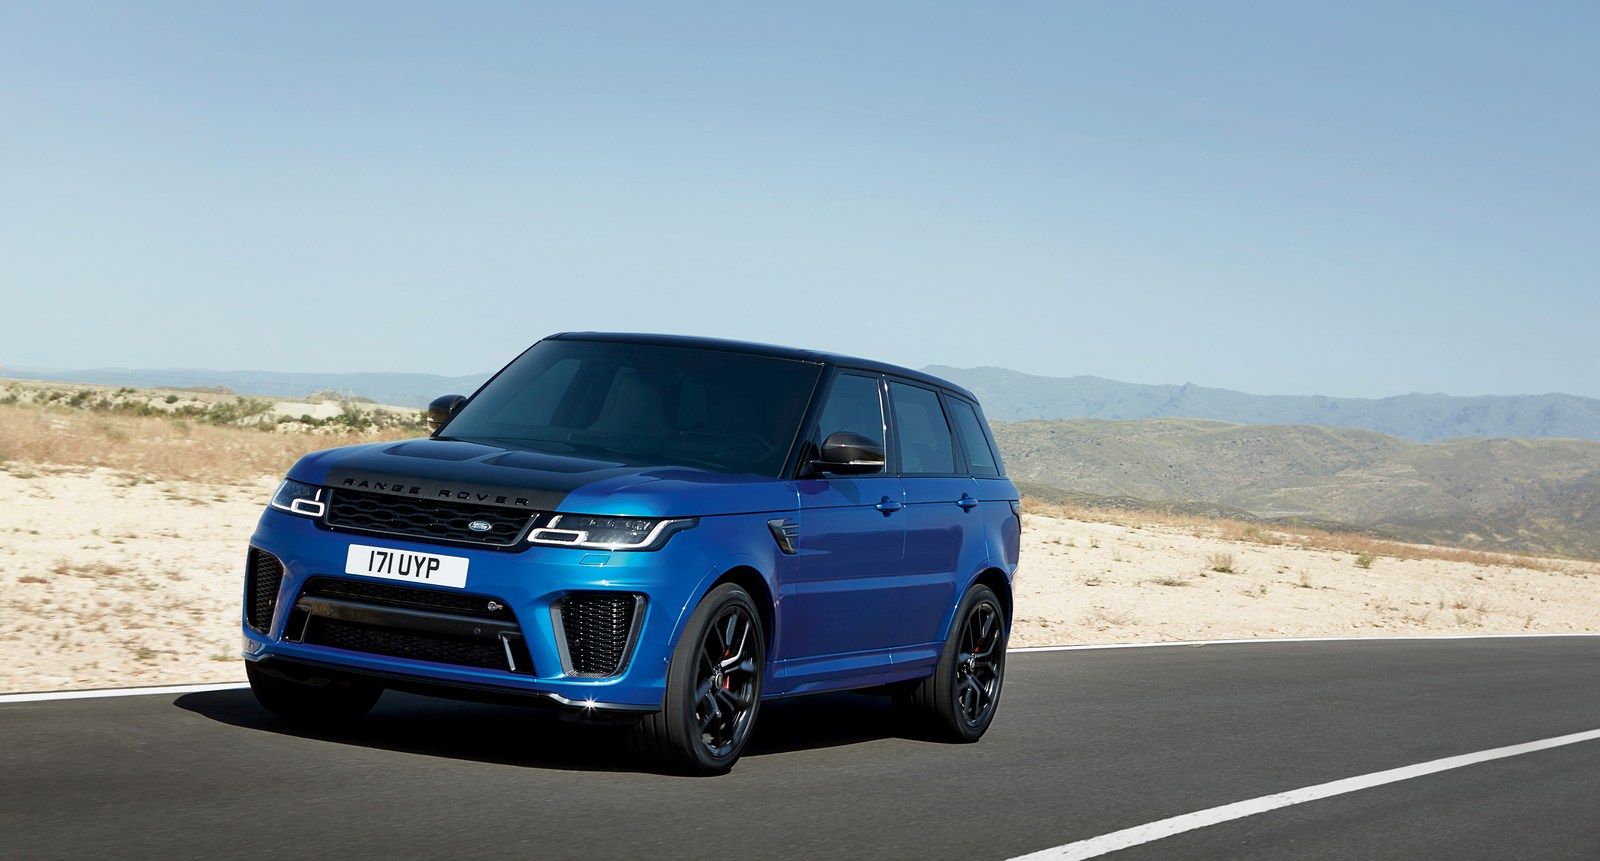 Range-Rover-Sport-7